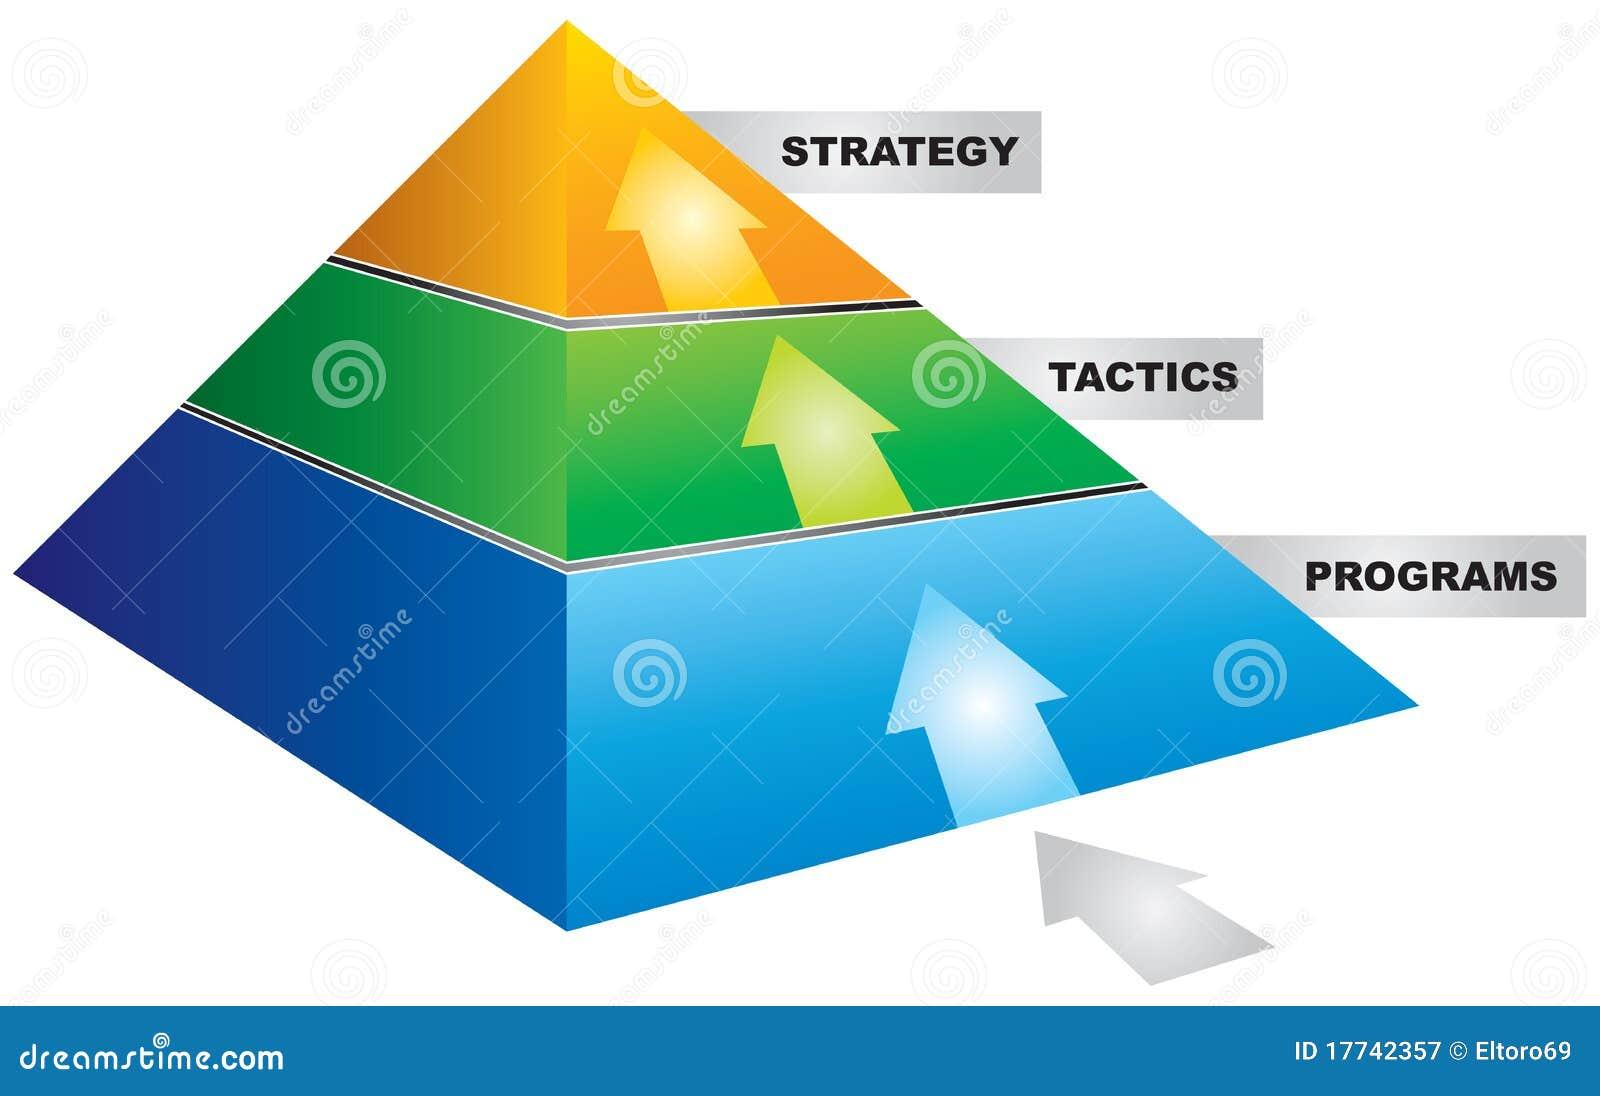 Strategy piramid